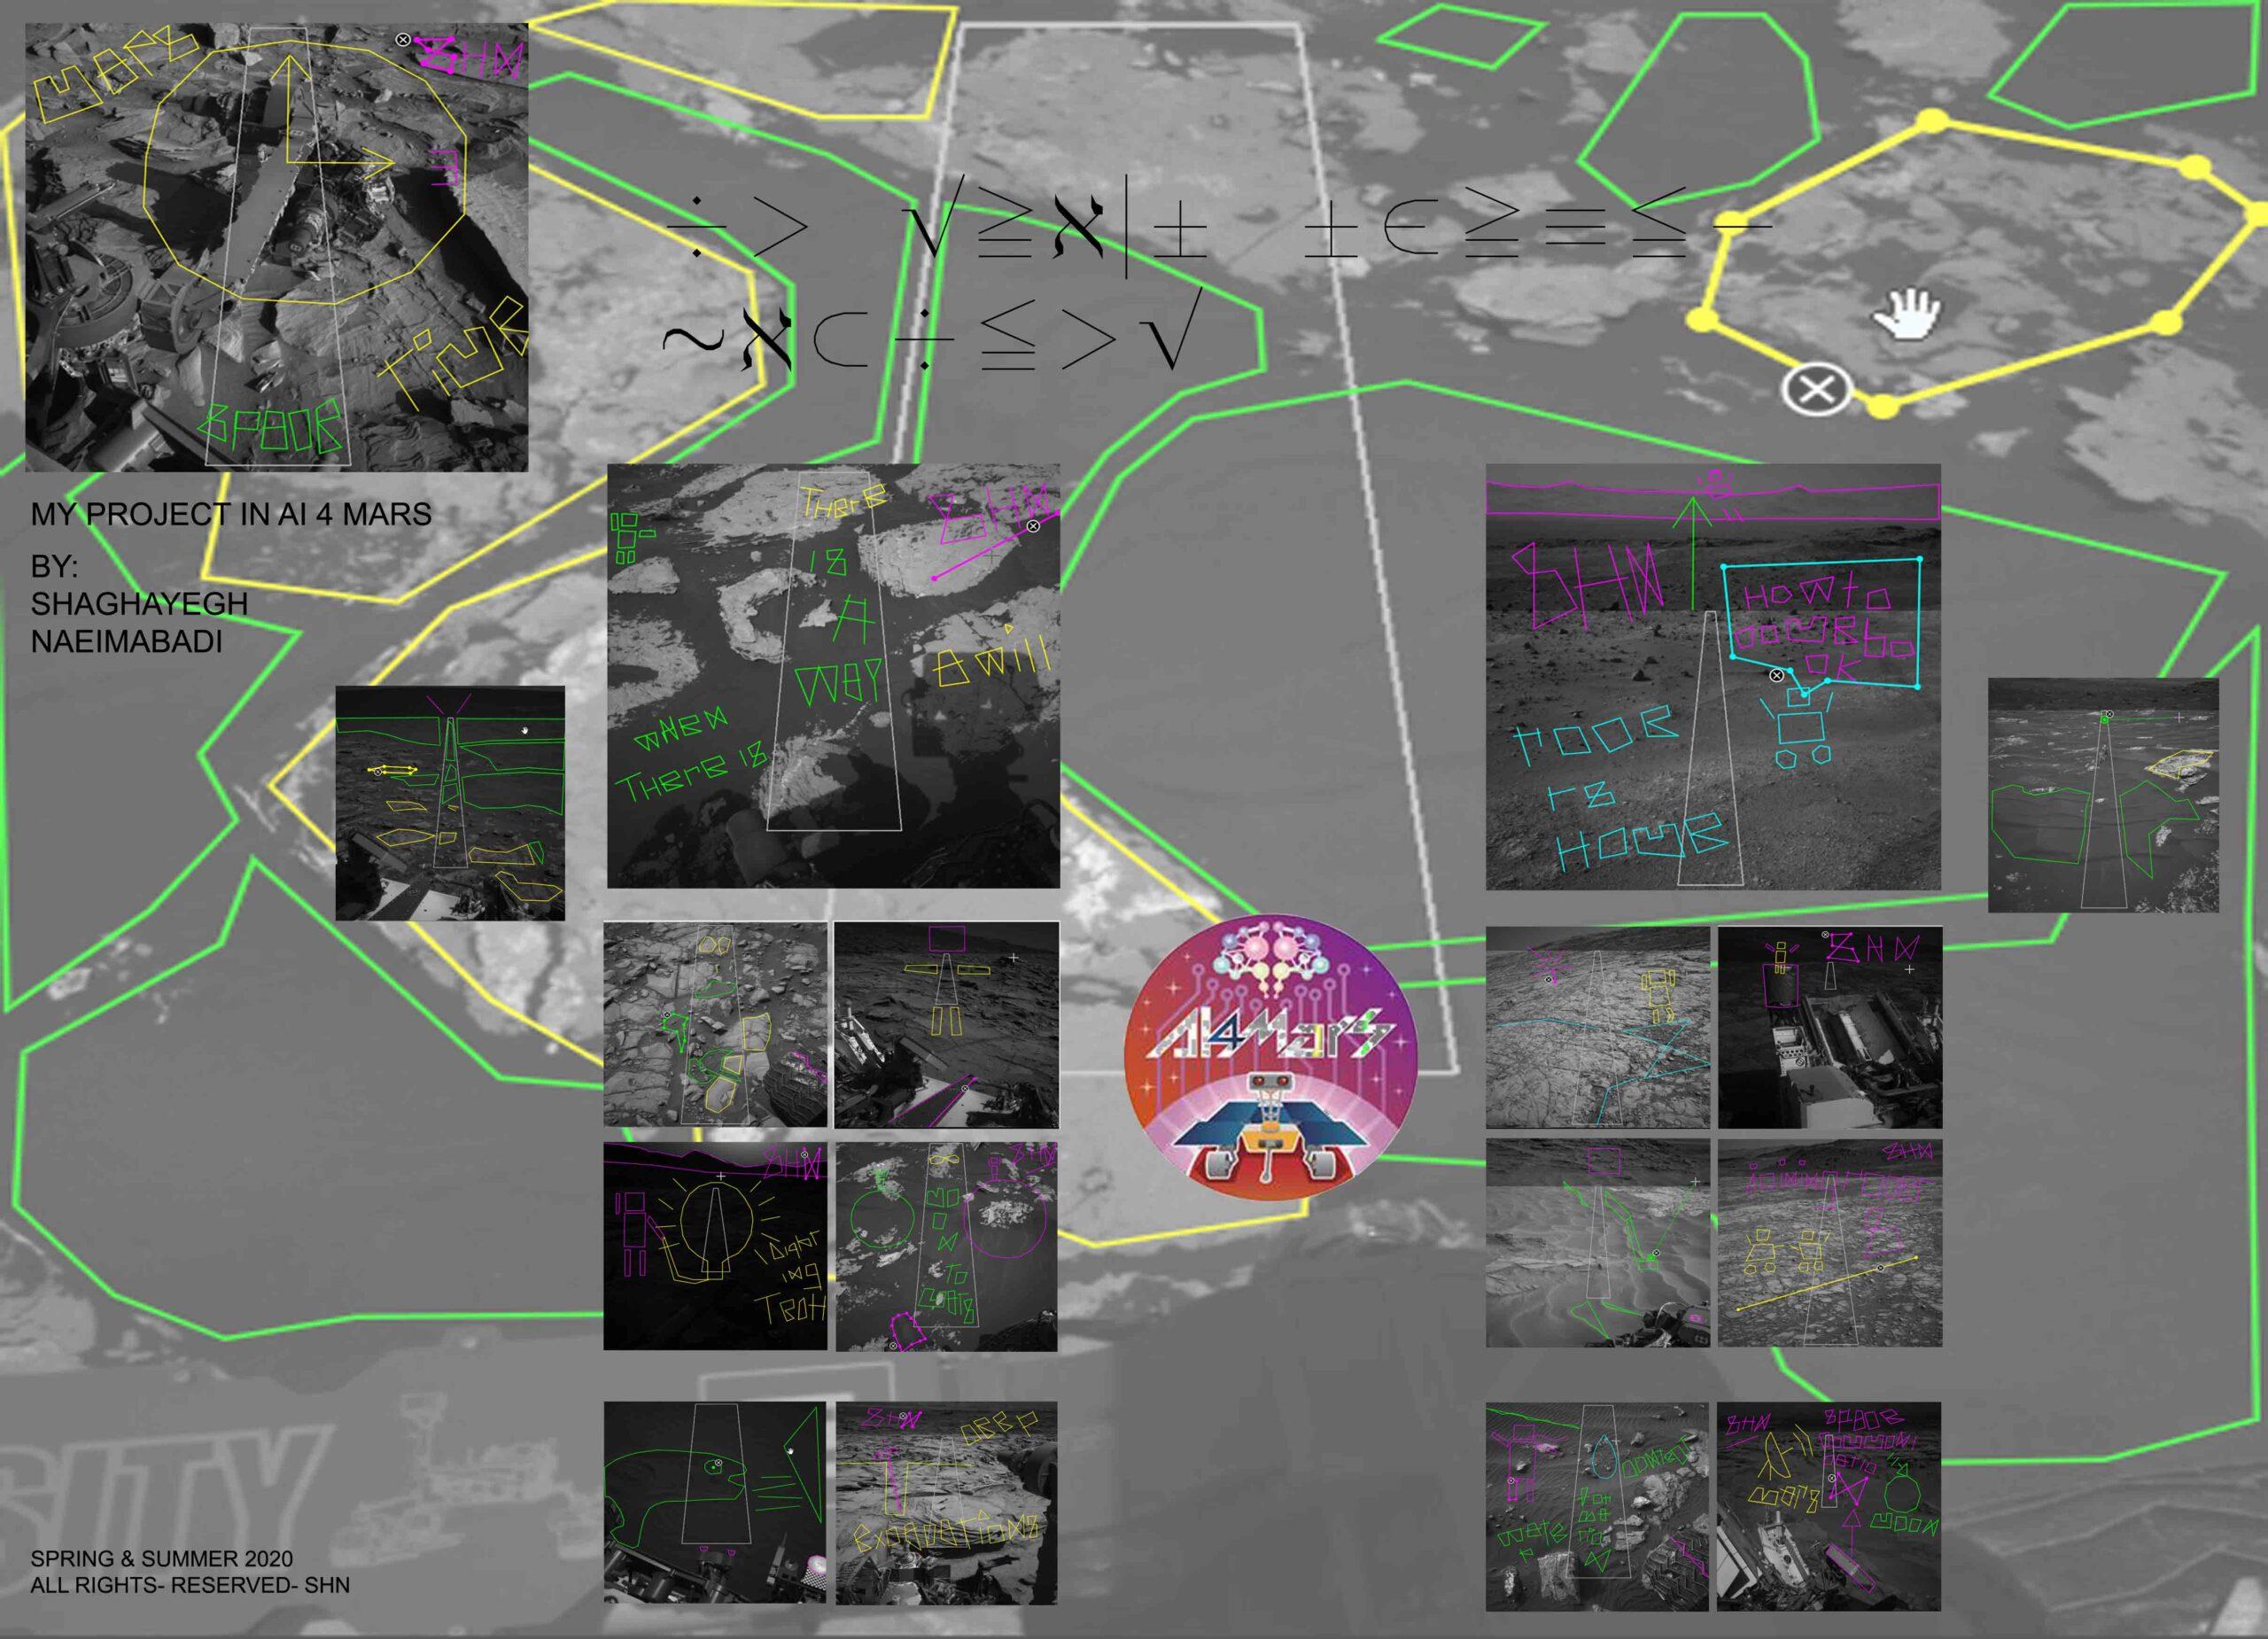 Shaghayegh Naeimabadi's Project/ AI 4 MARS